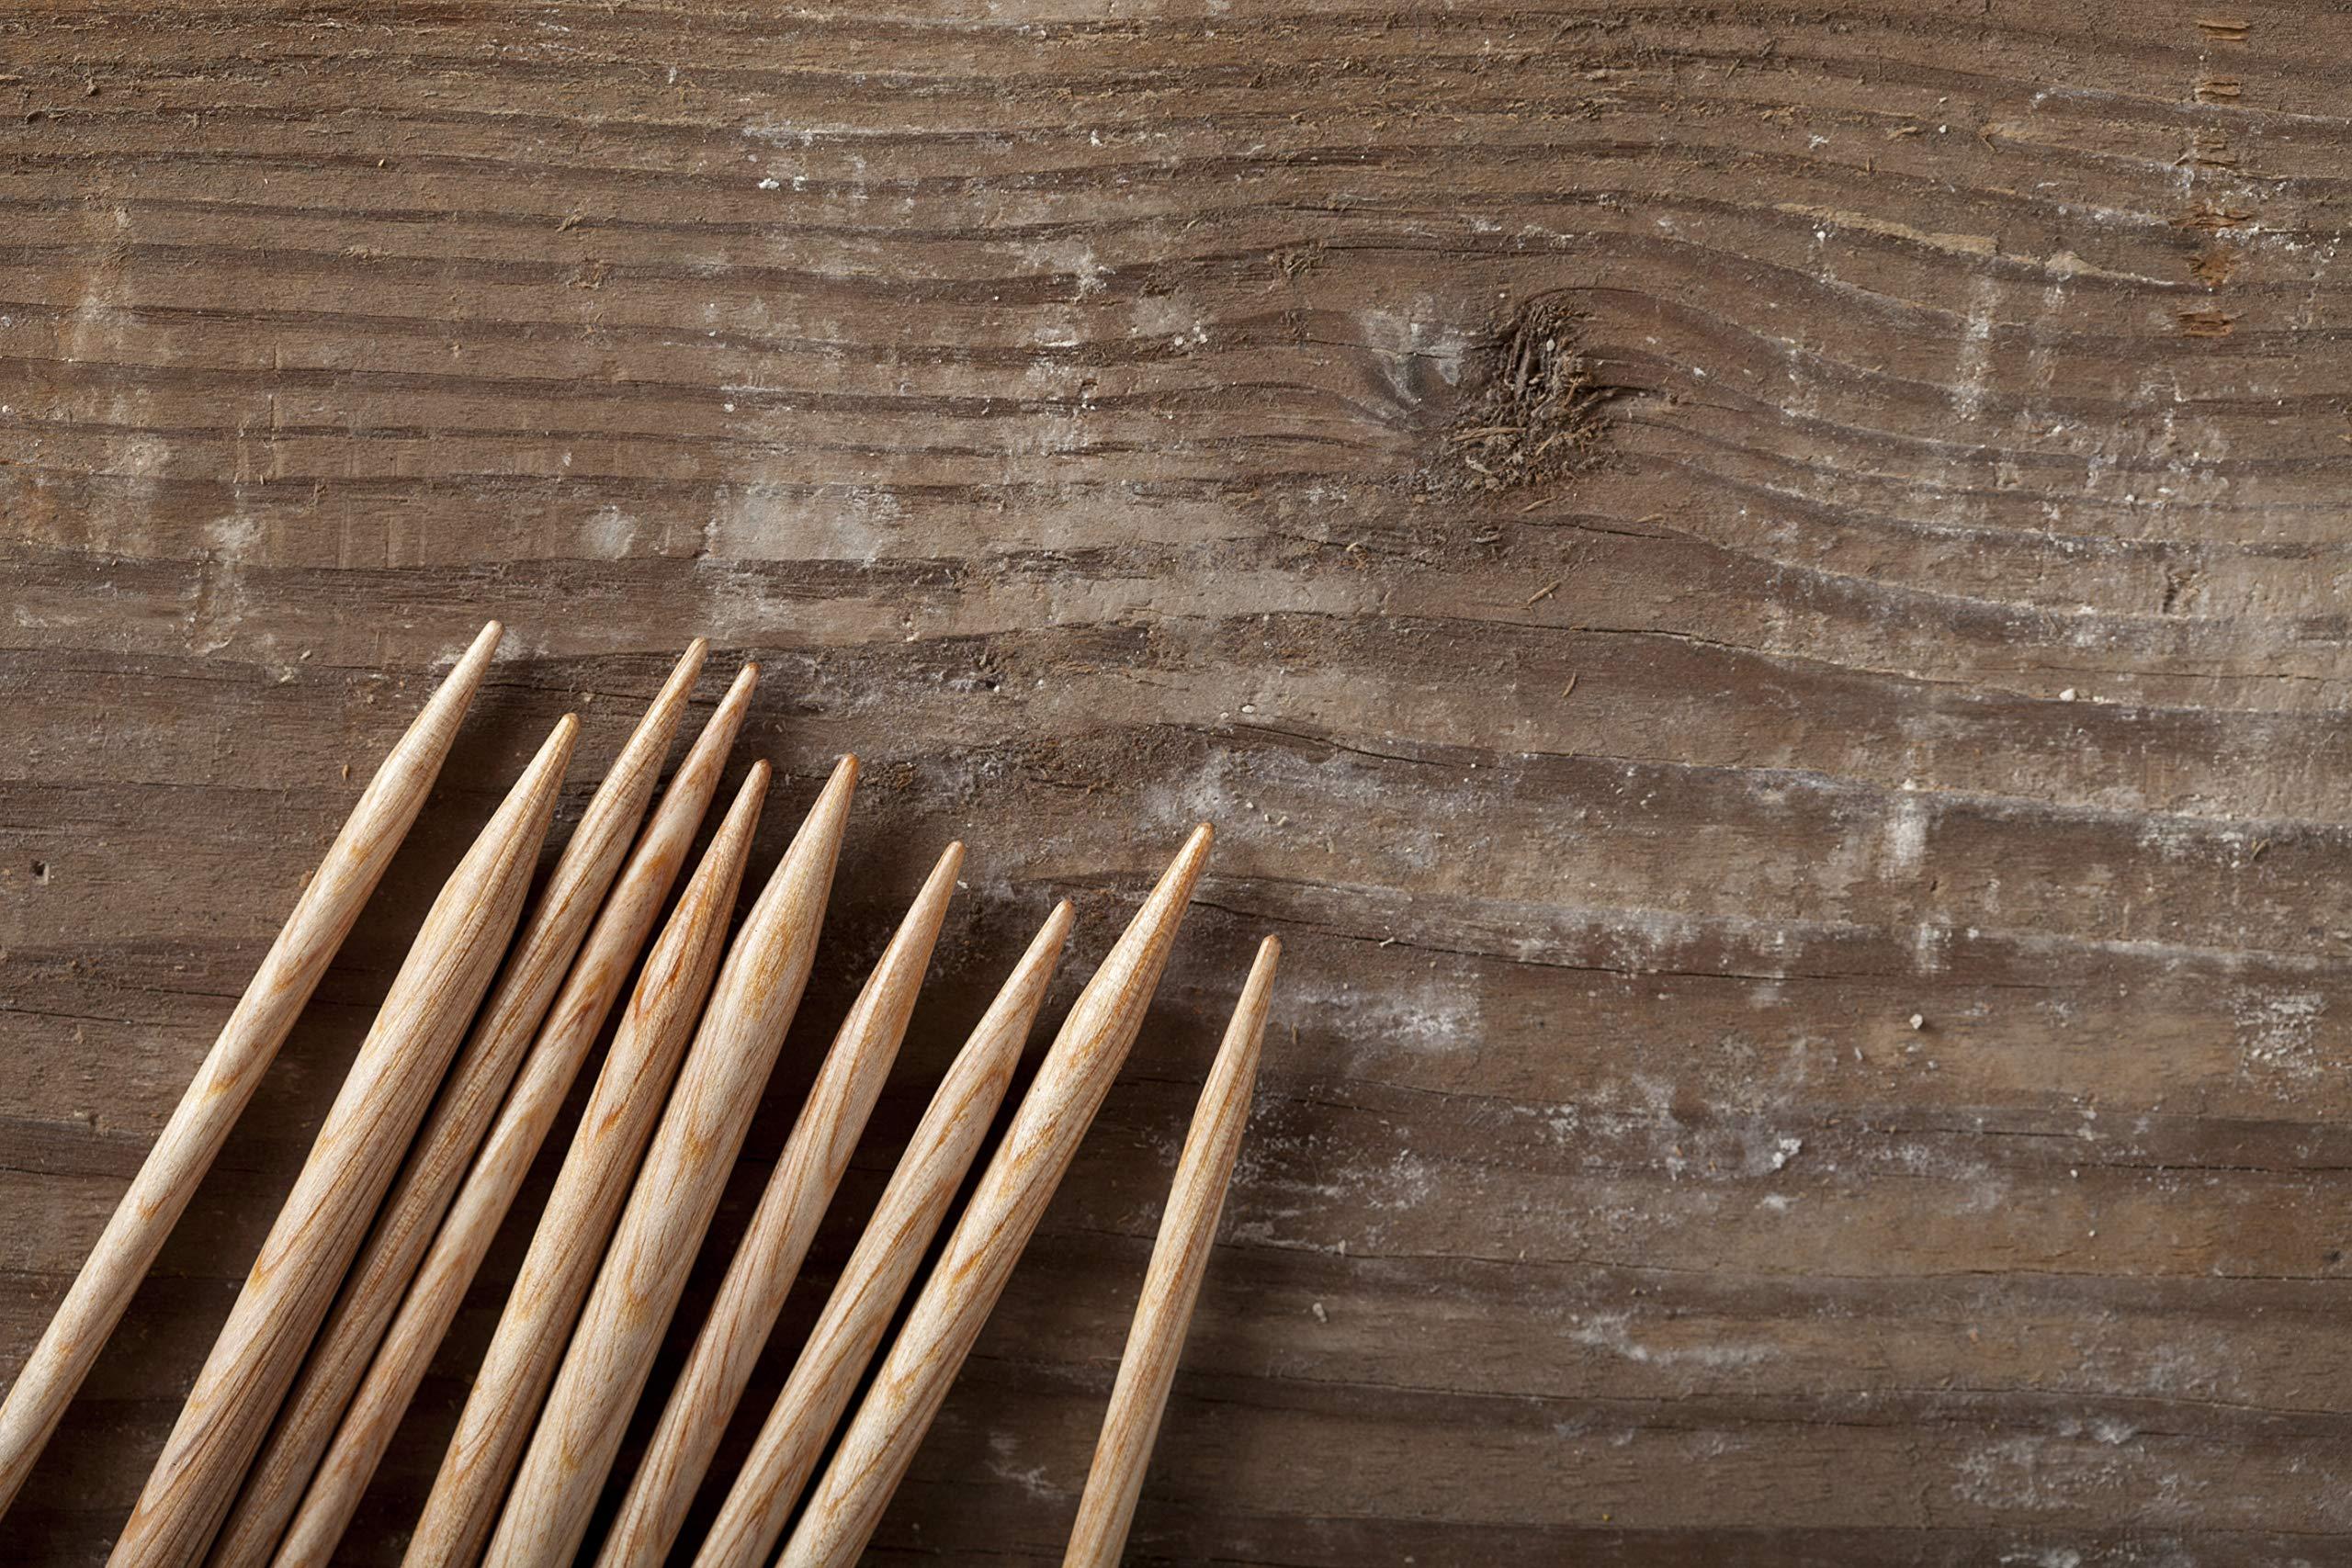 Knit Picks Wood Straight Single Point Knitting Needle Set US 4-11 (14'' - Sunstruck)